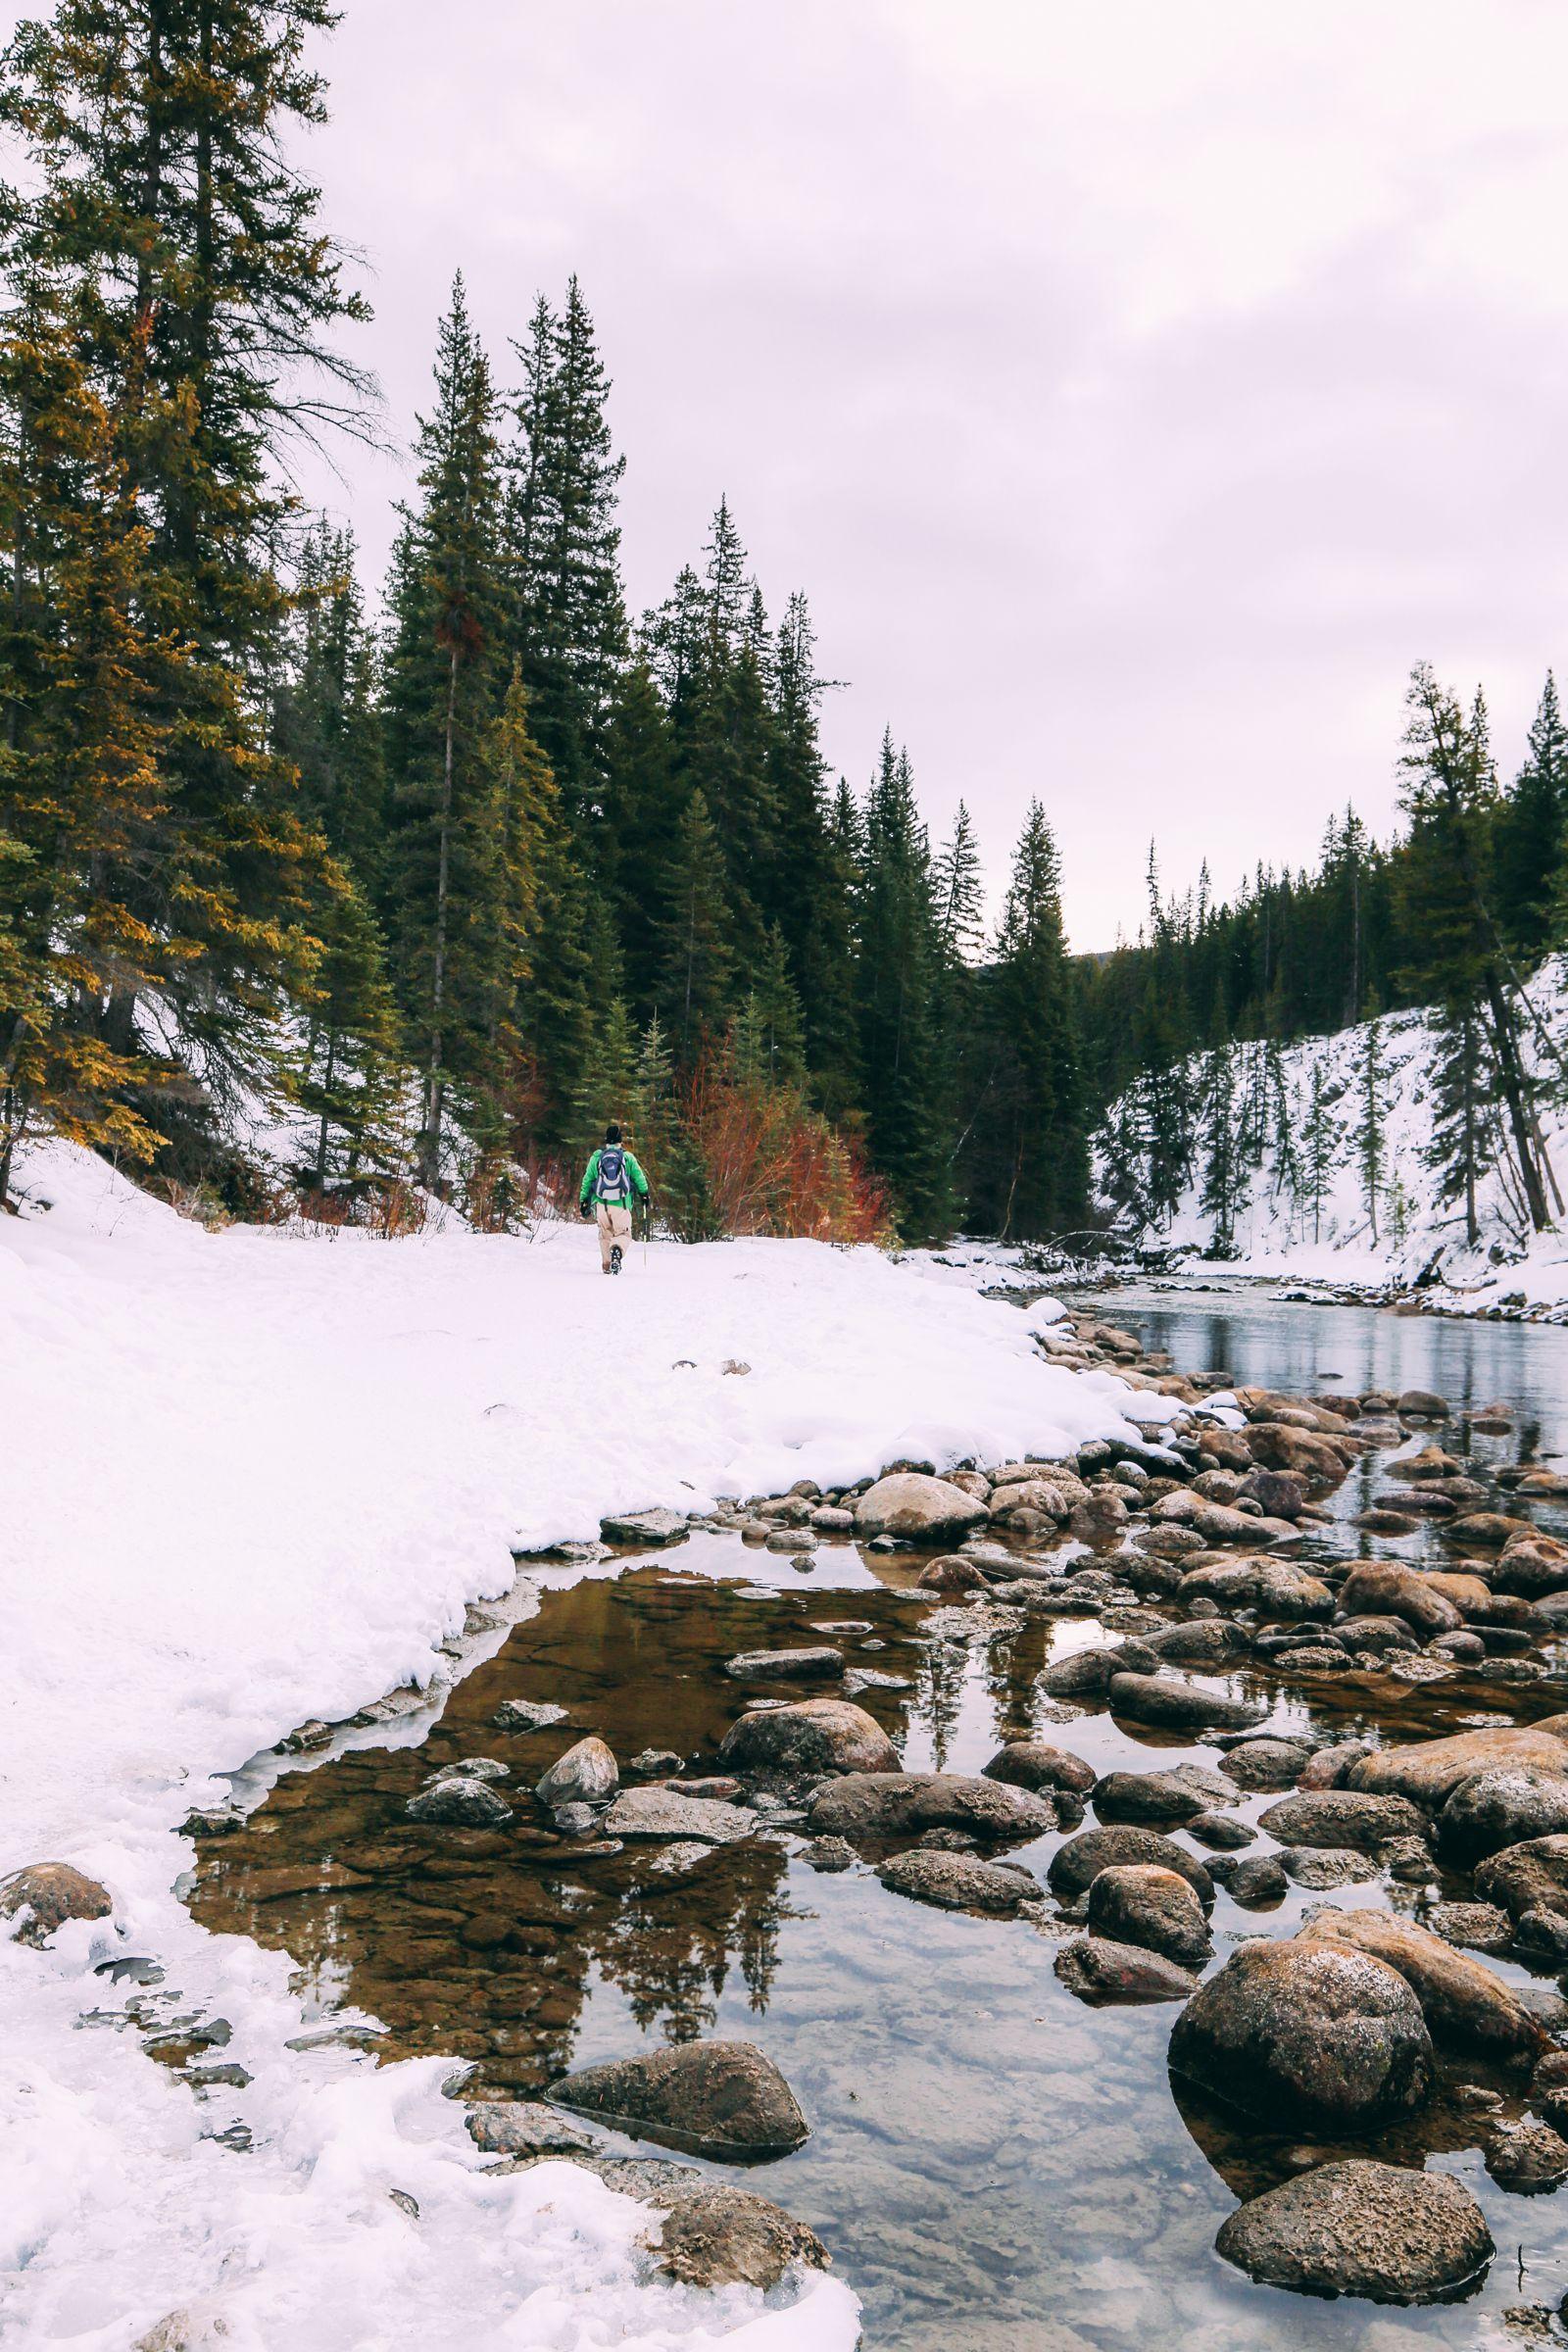 The Most Beautiful Place In Jasper (Canada) You've Never Heard Of! (5)